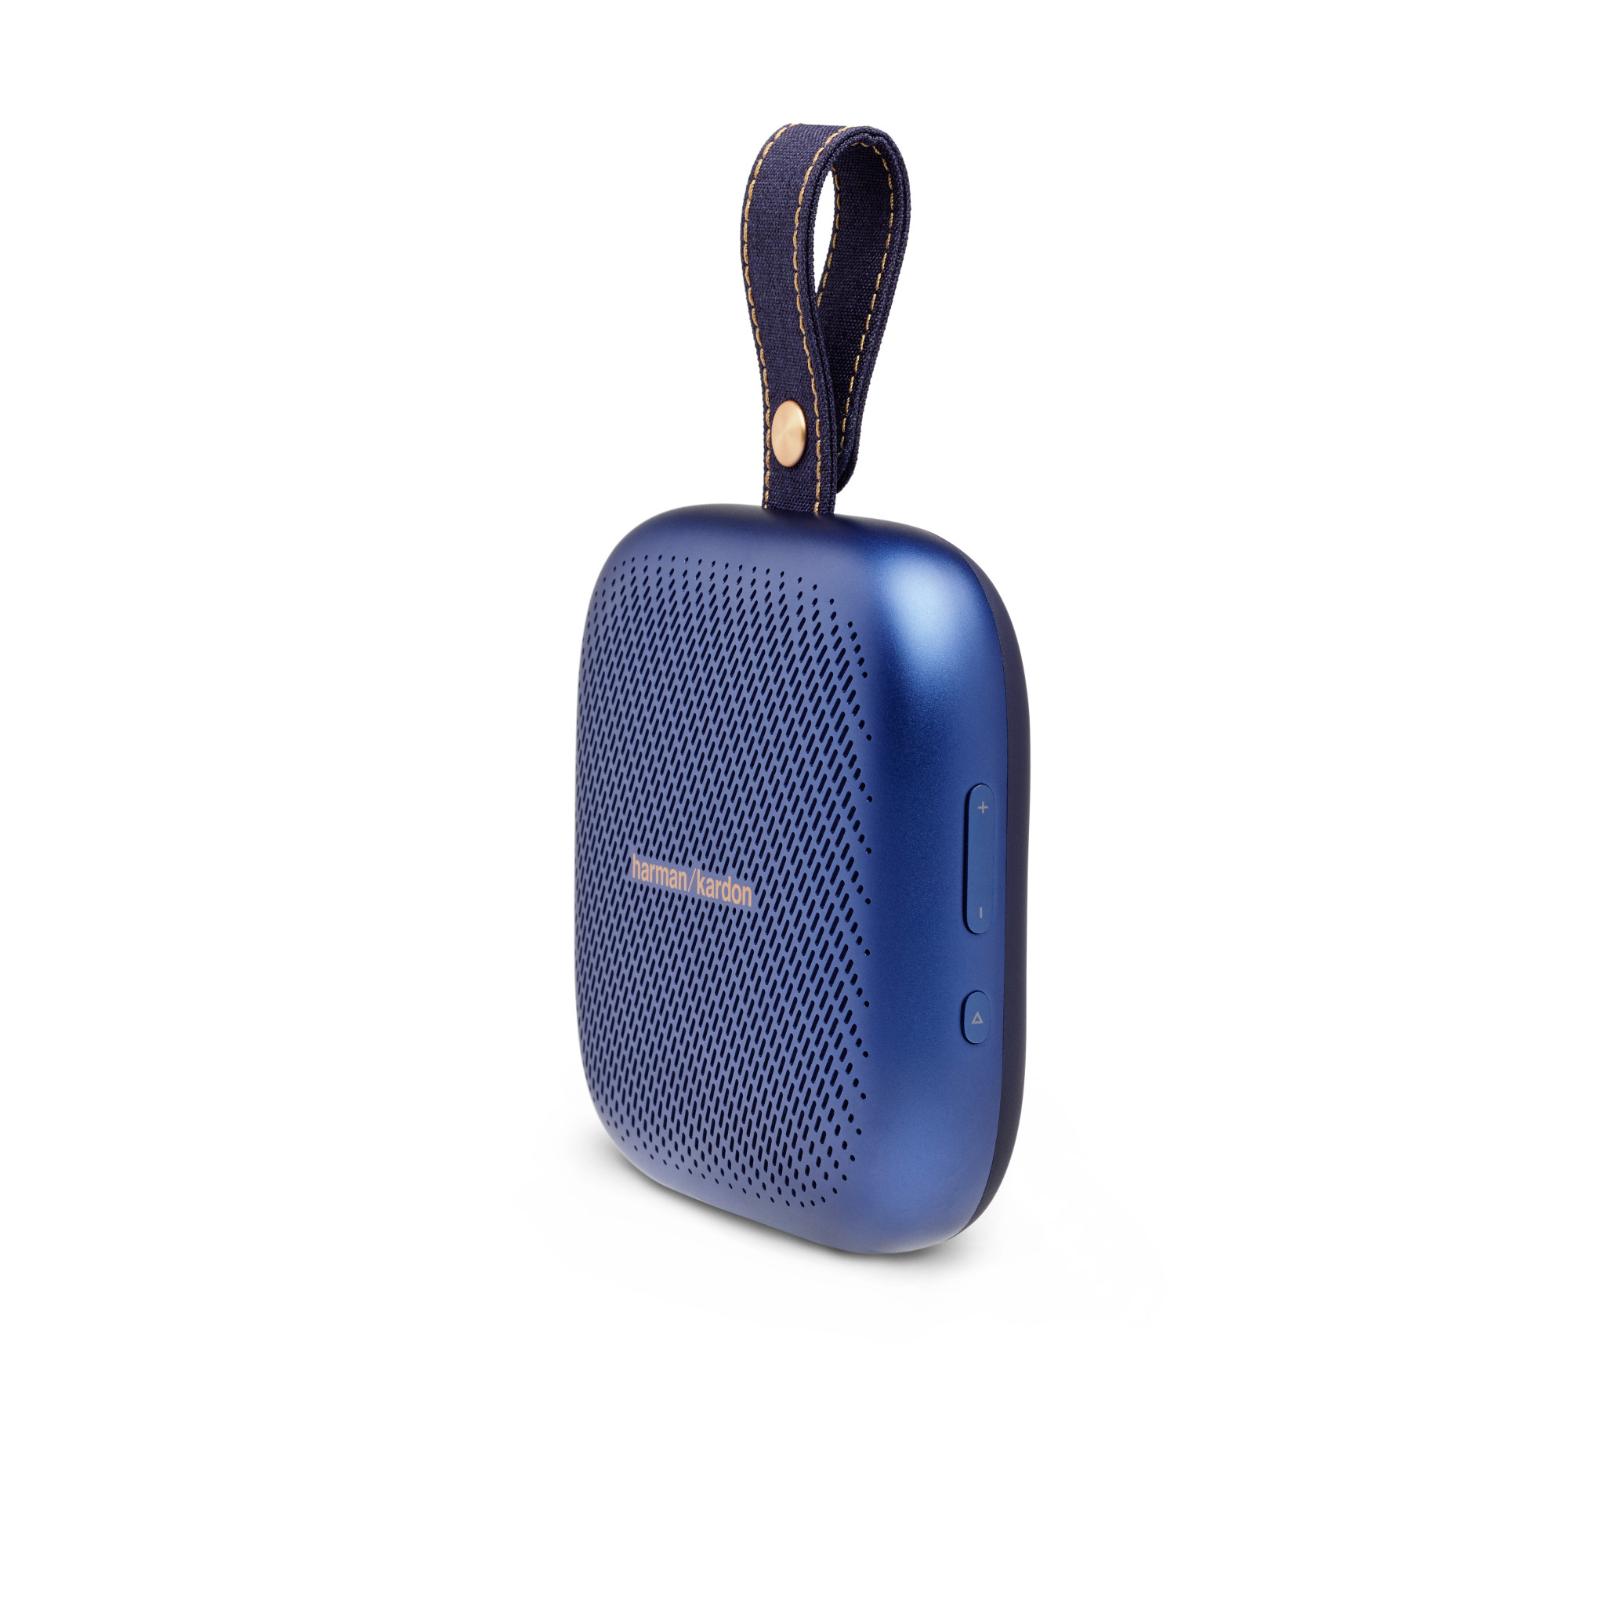 Harman Kardon Neo - Midnight Blue - Portable Bluetooth speaker - Left